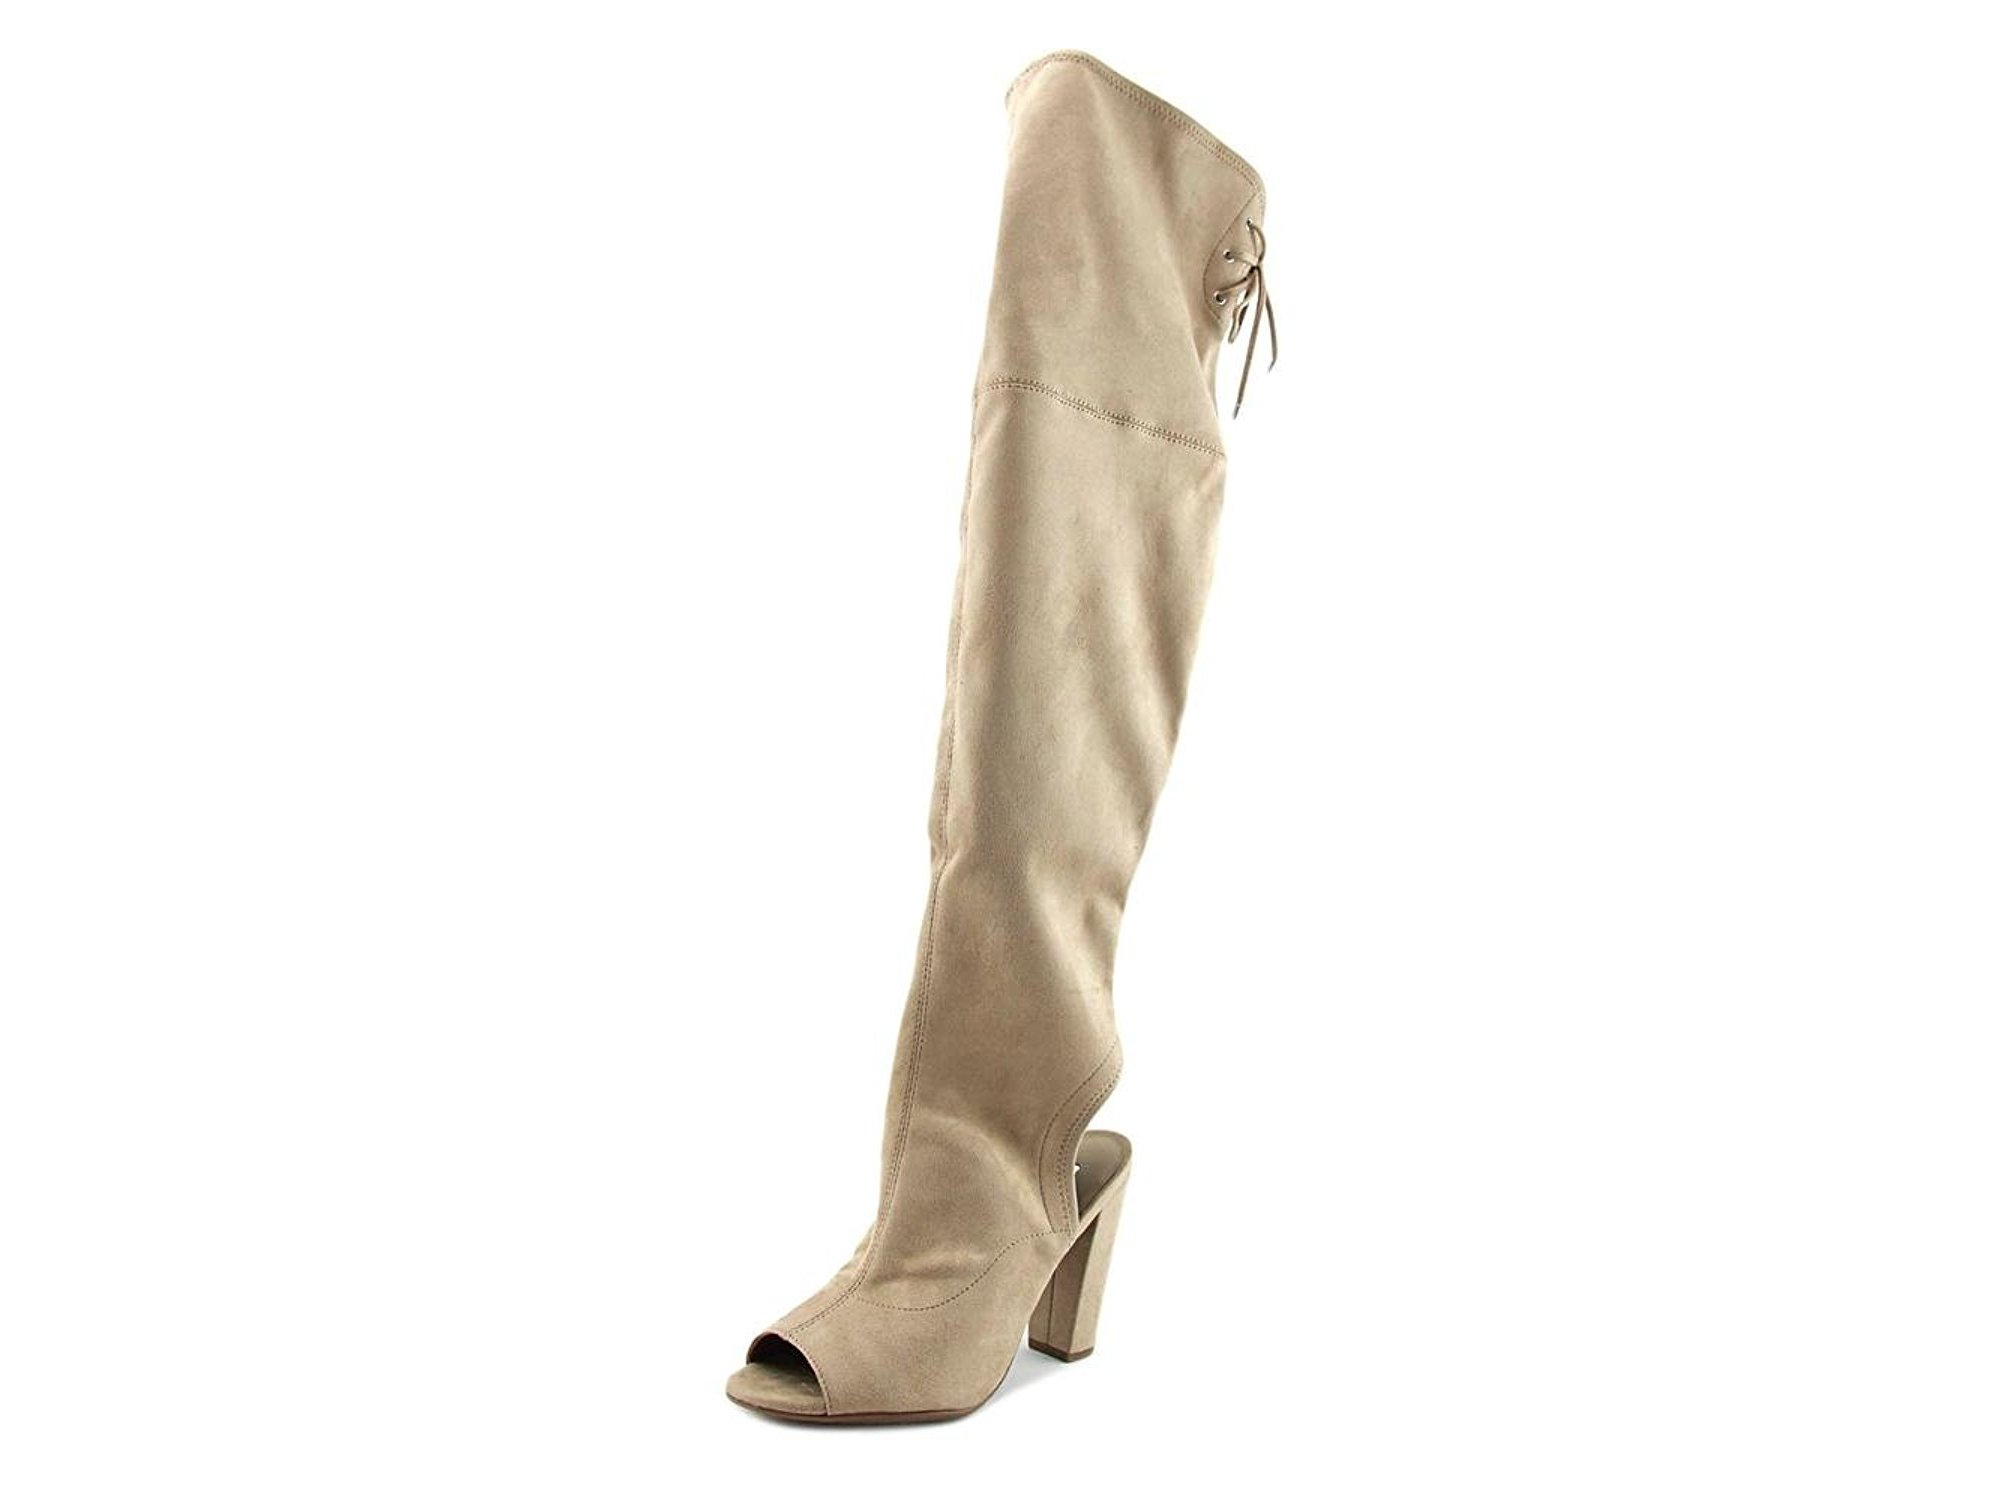 GUESS GUESS GUESS Damenschuhe Galle Open Toe Knee High Fashion Stiefel 979b40